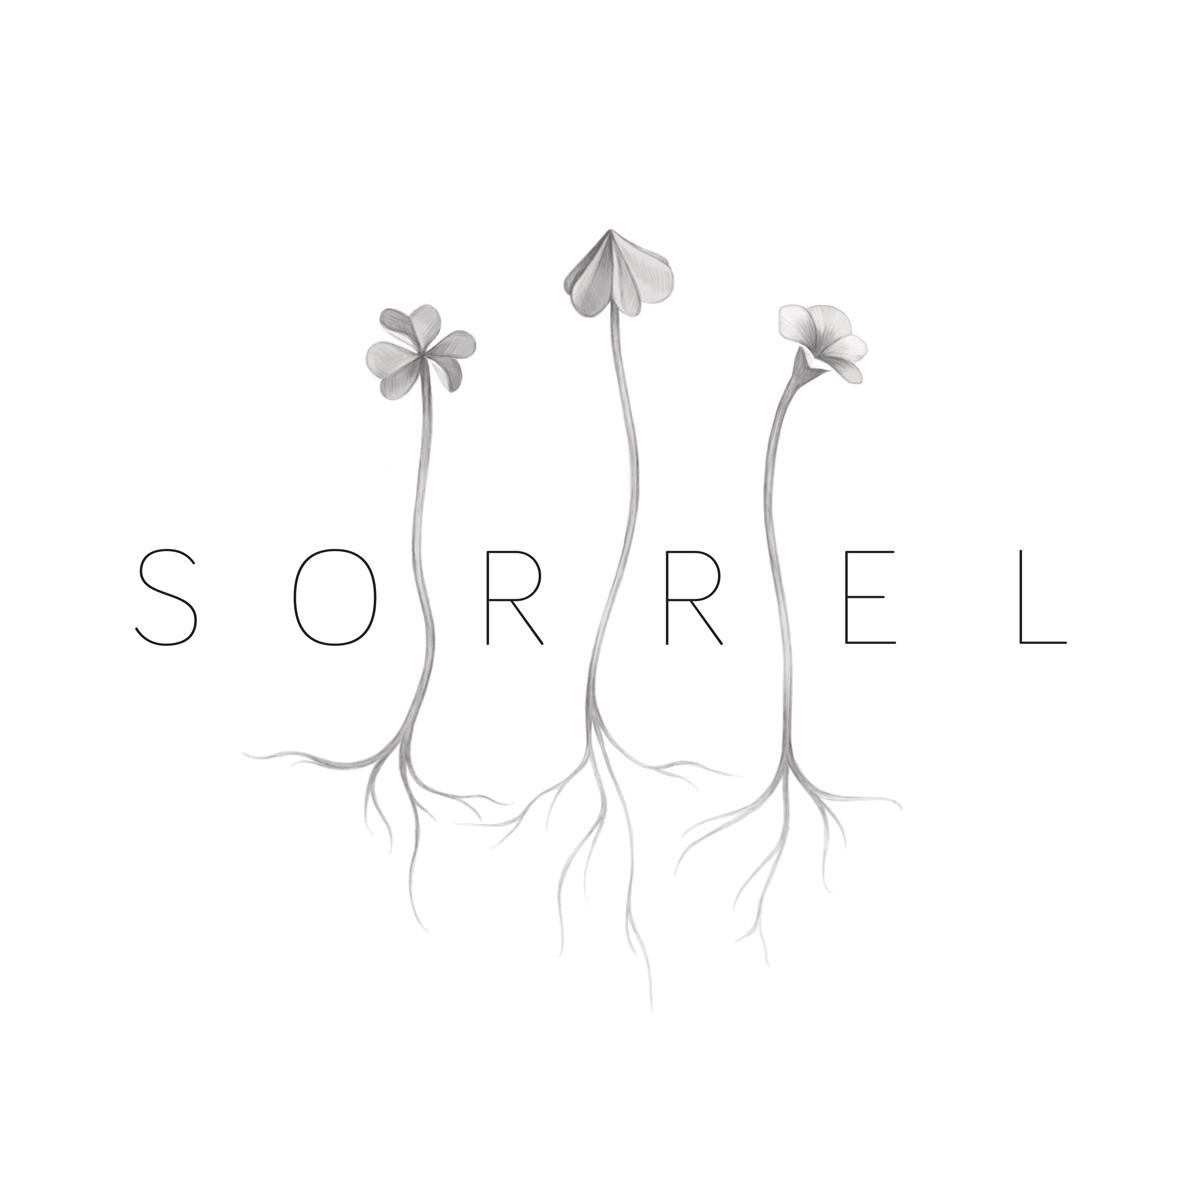 sophia sweeney sorrel logo